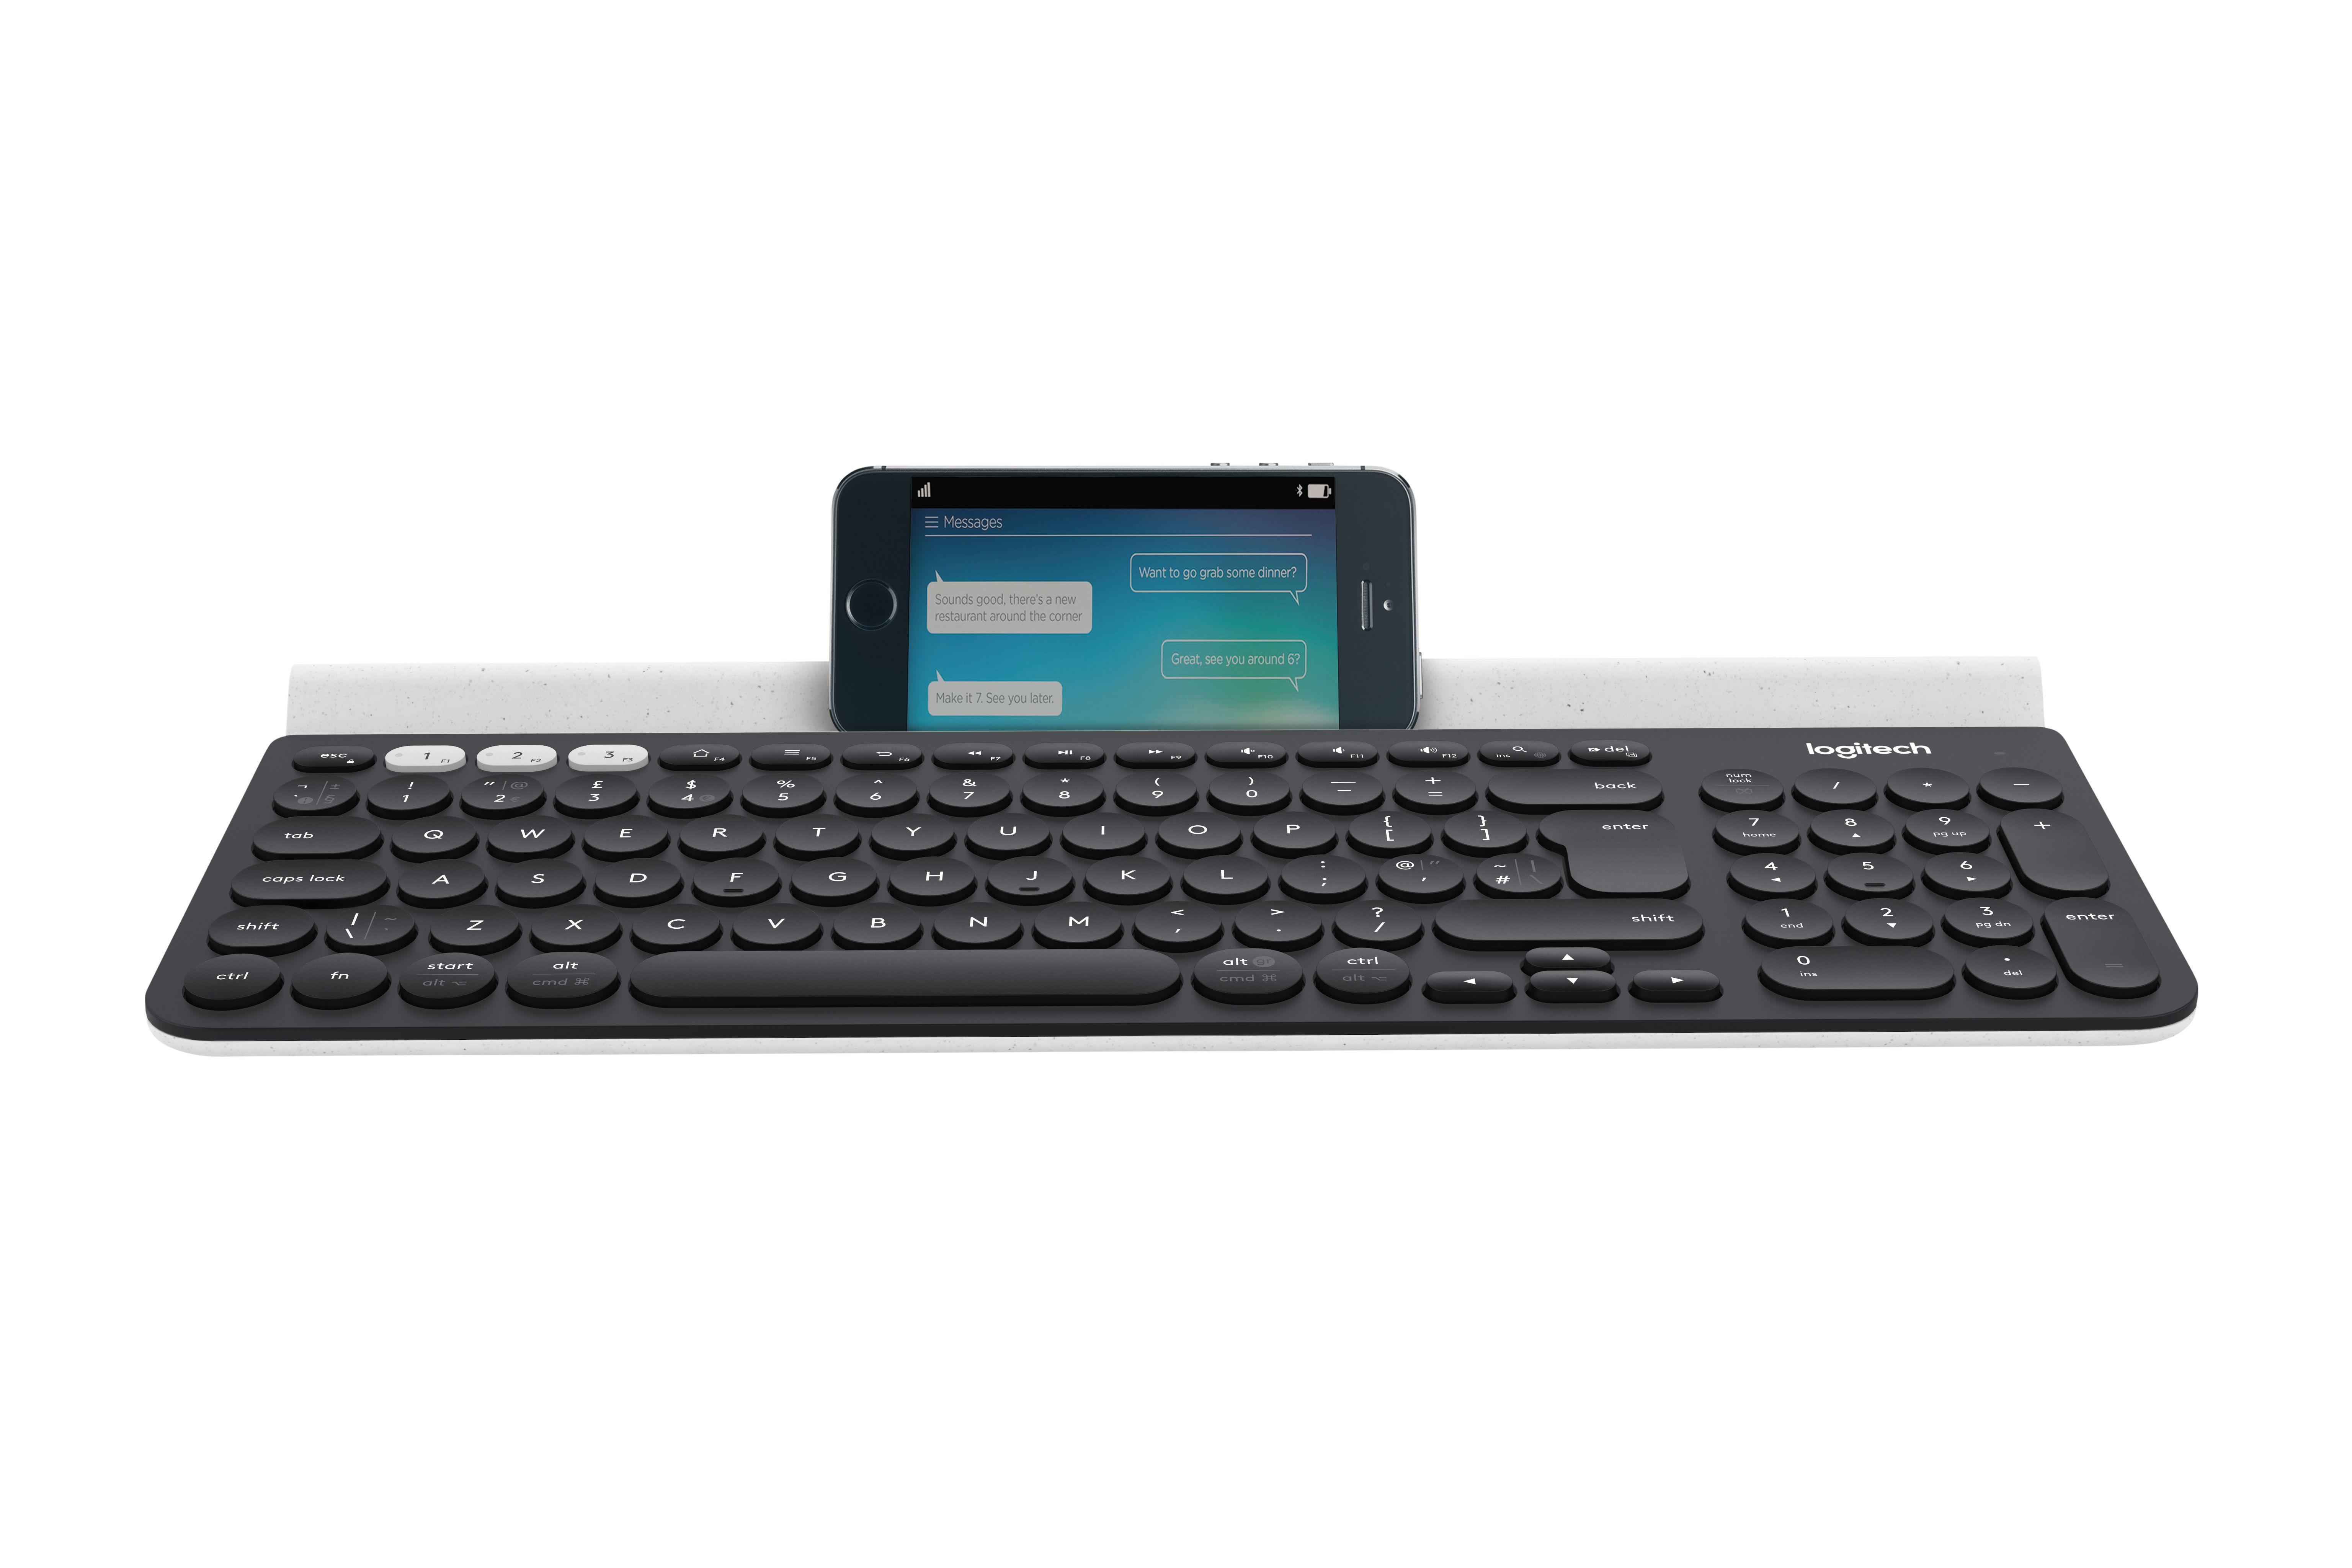 Specs Logitech K780 keyboard RF Wireless + Bluetooth QWERTY